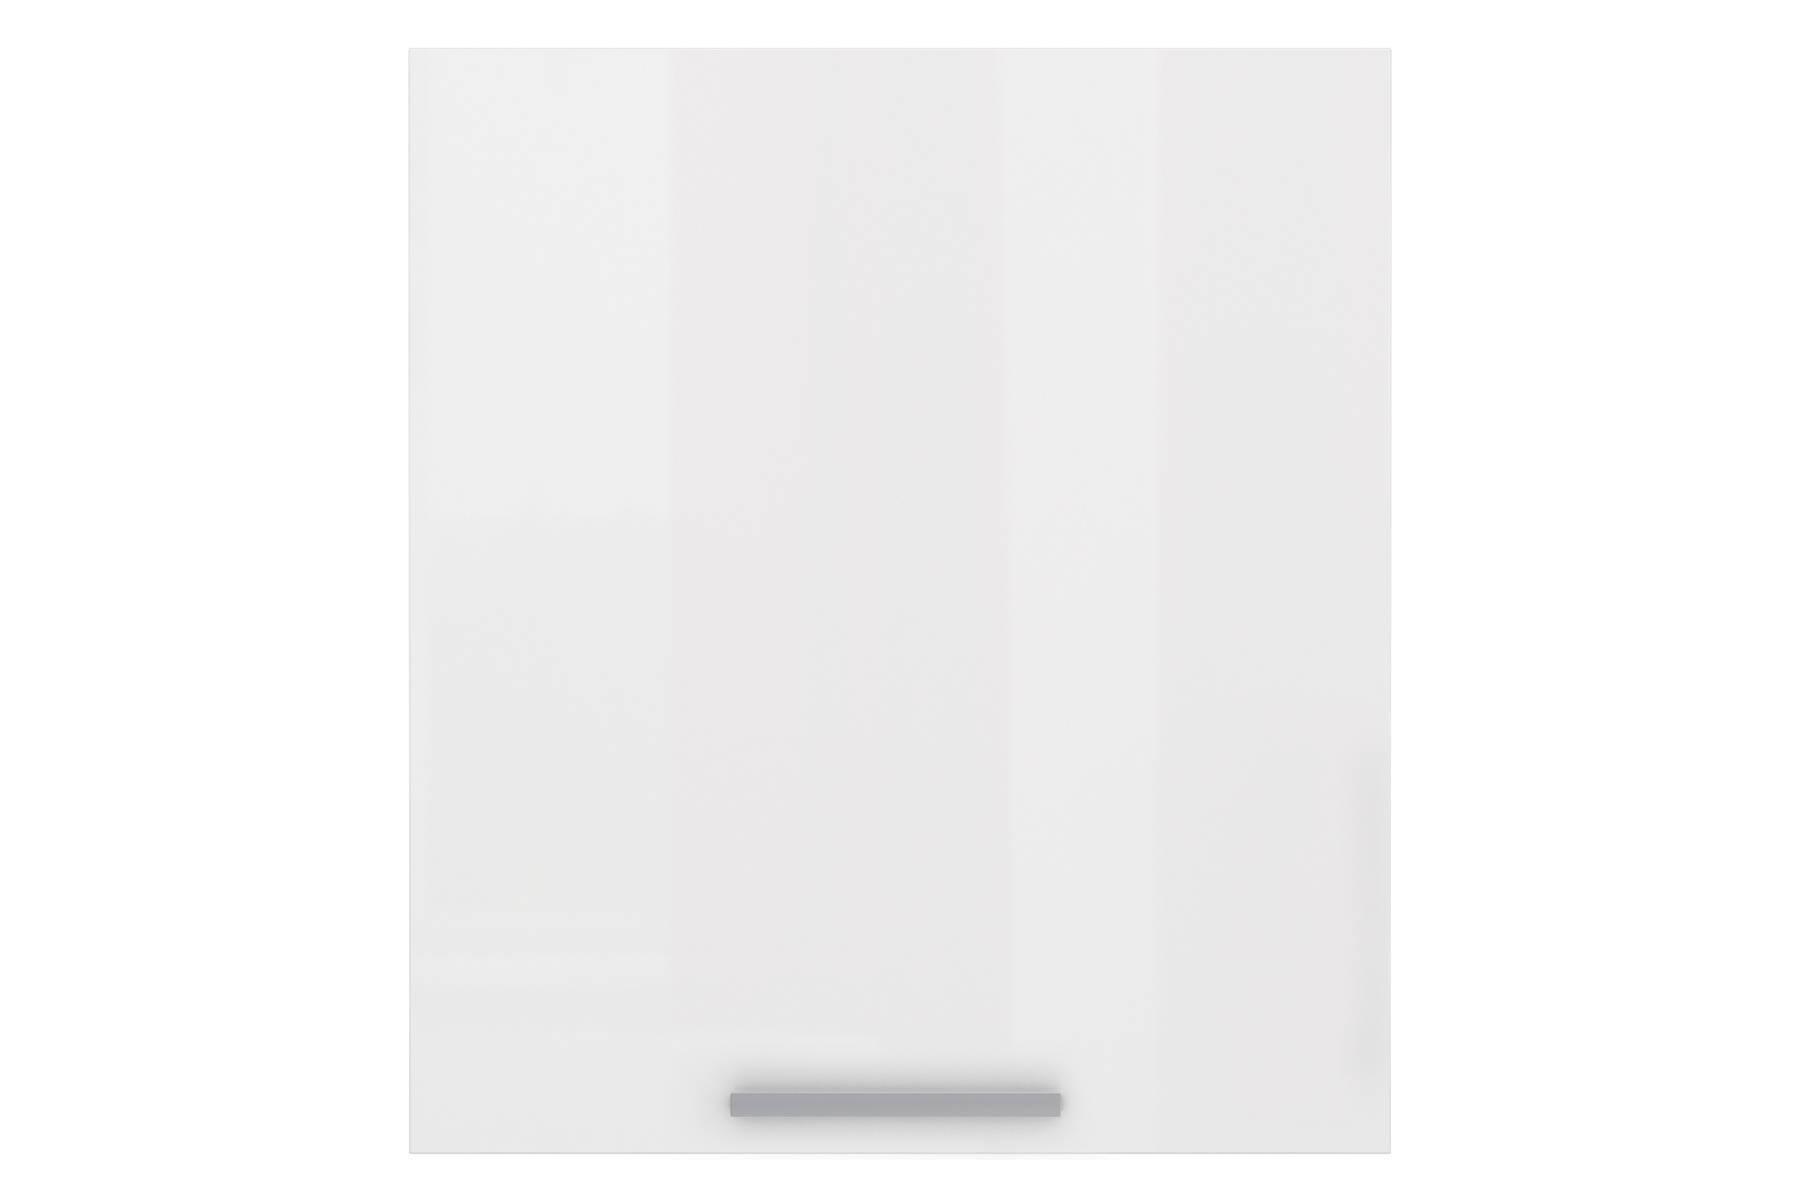 Фасад Хелена СТЛ.276.09 Белый глянец хелена роз свои правила